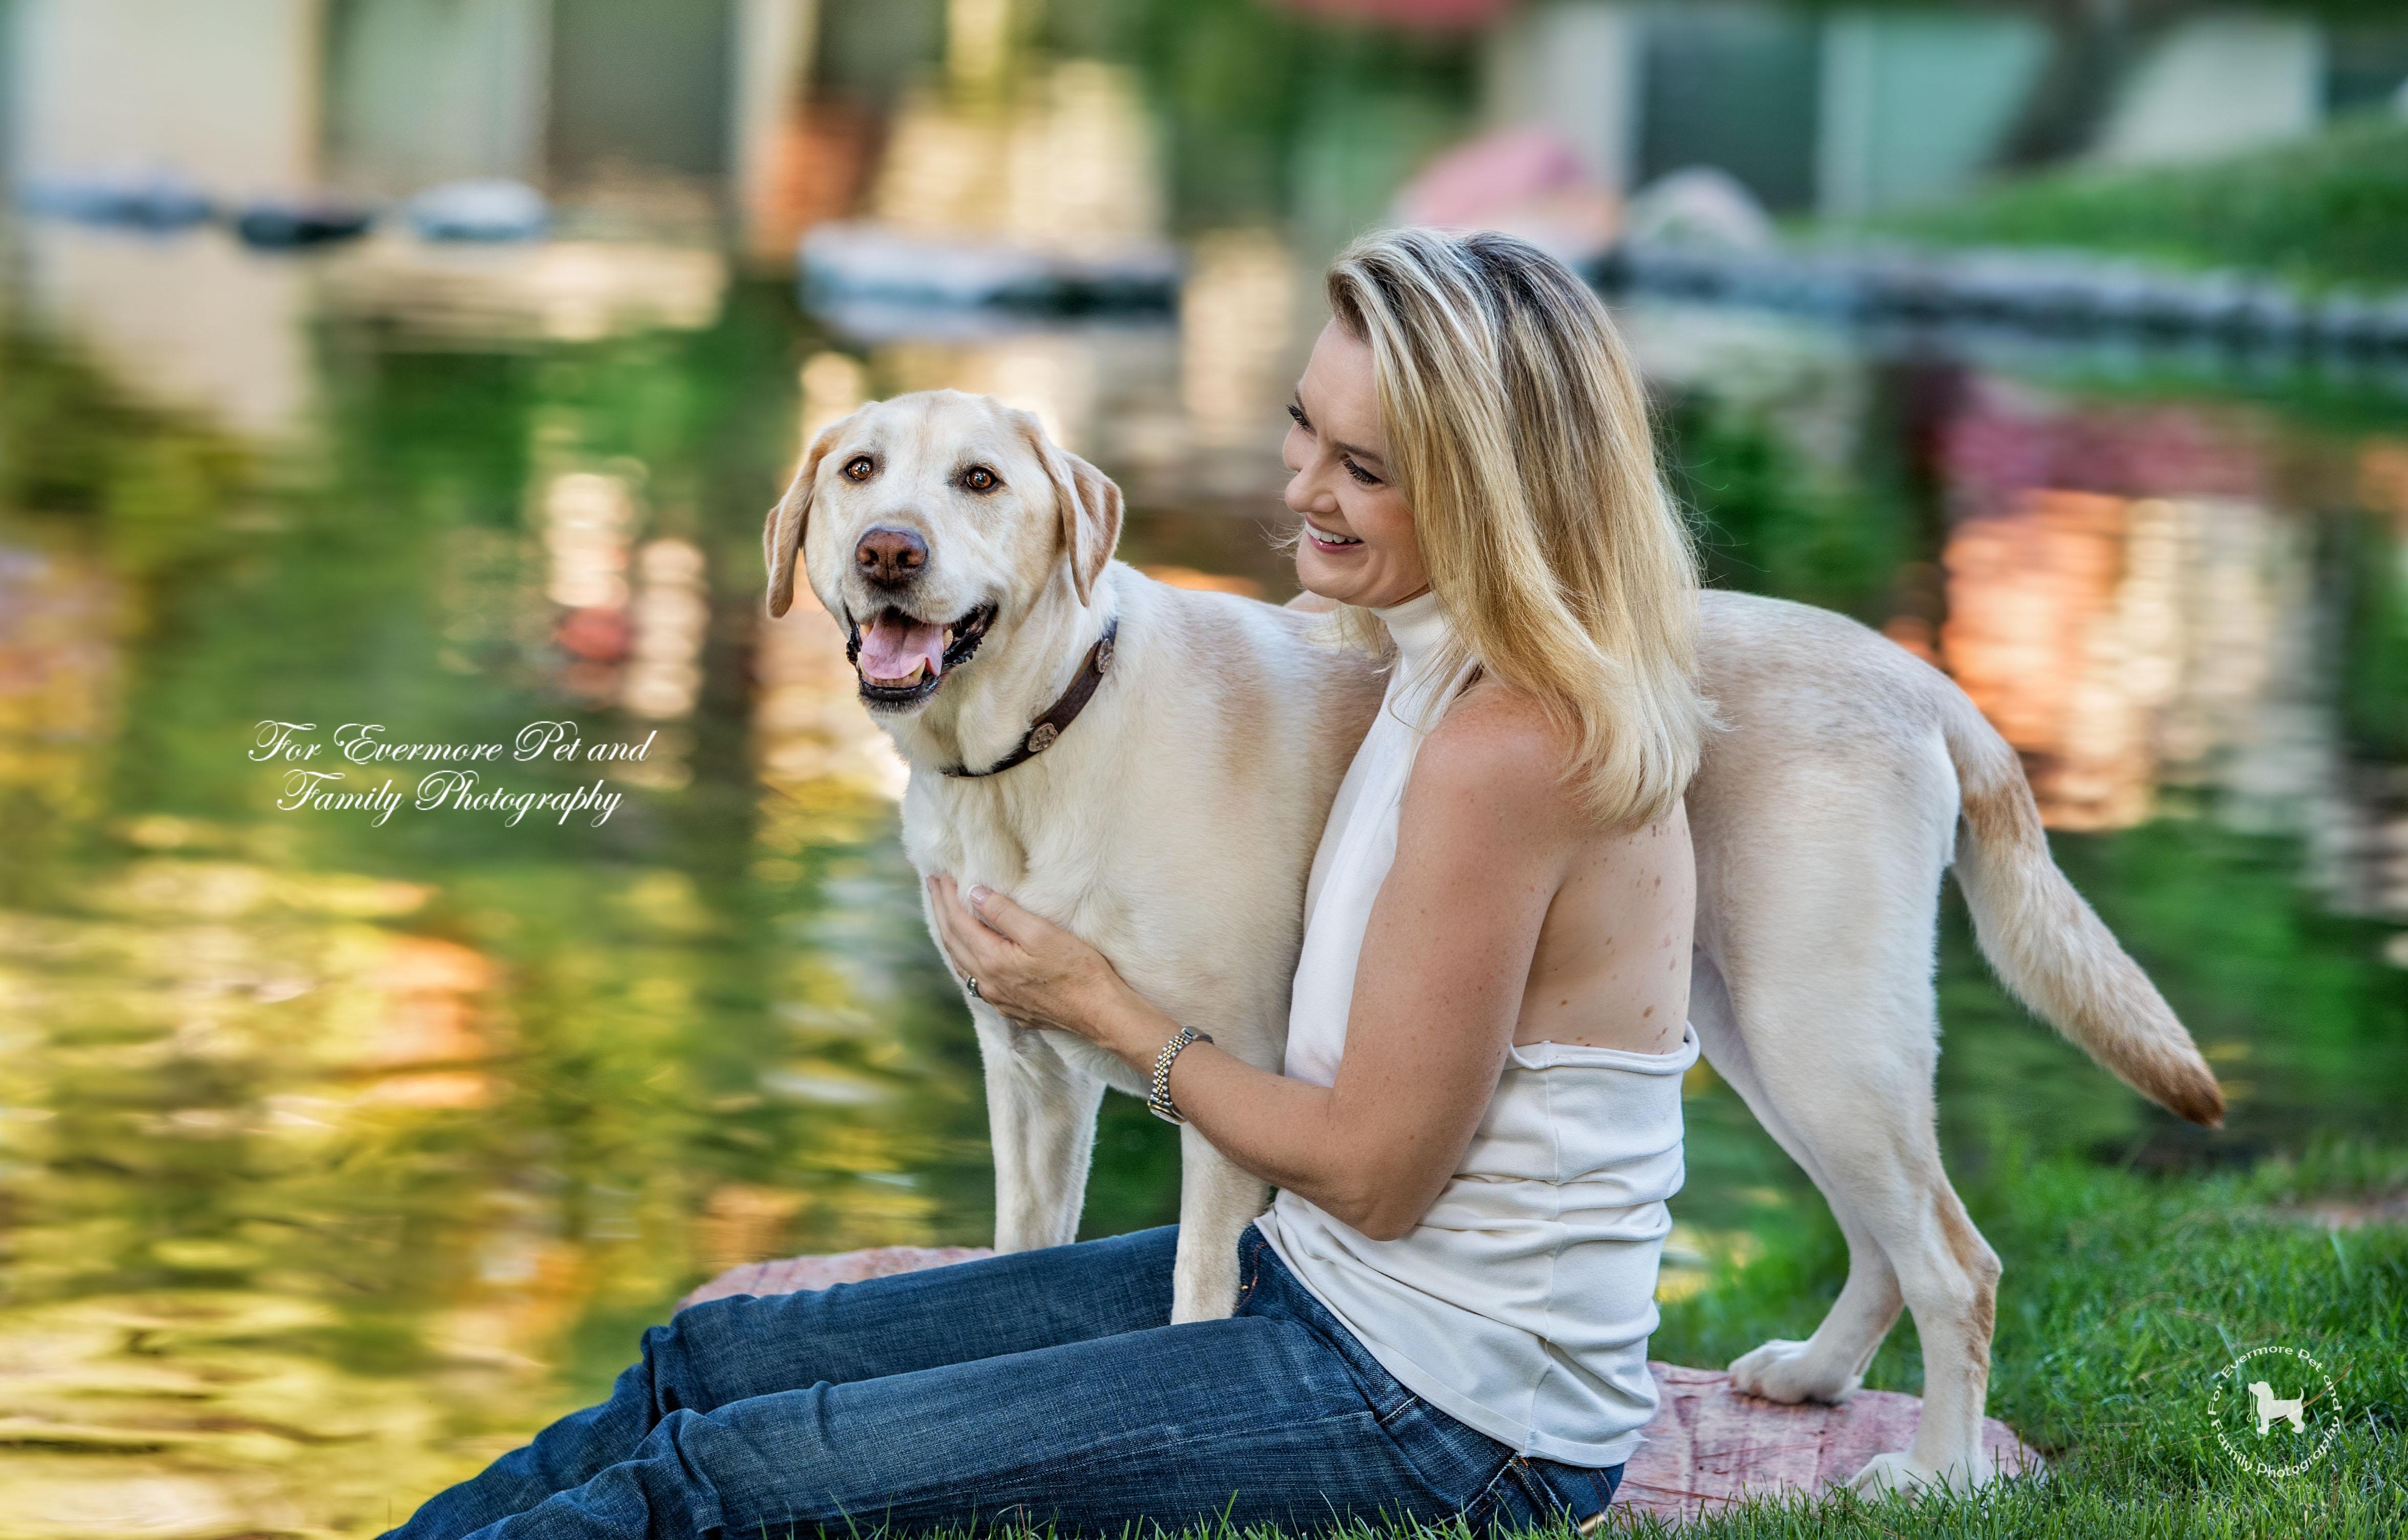 Idaho and his beautiful mom